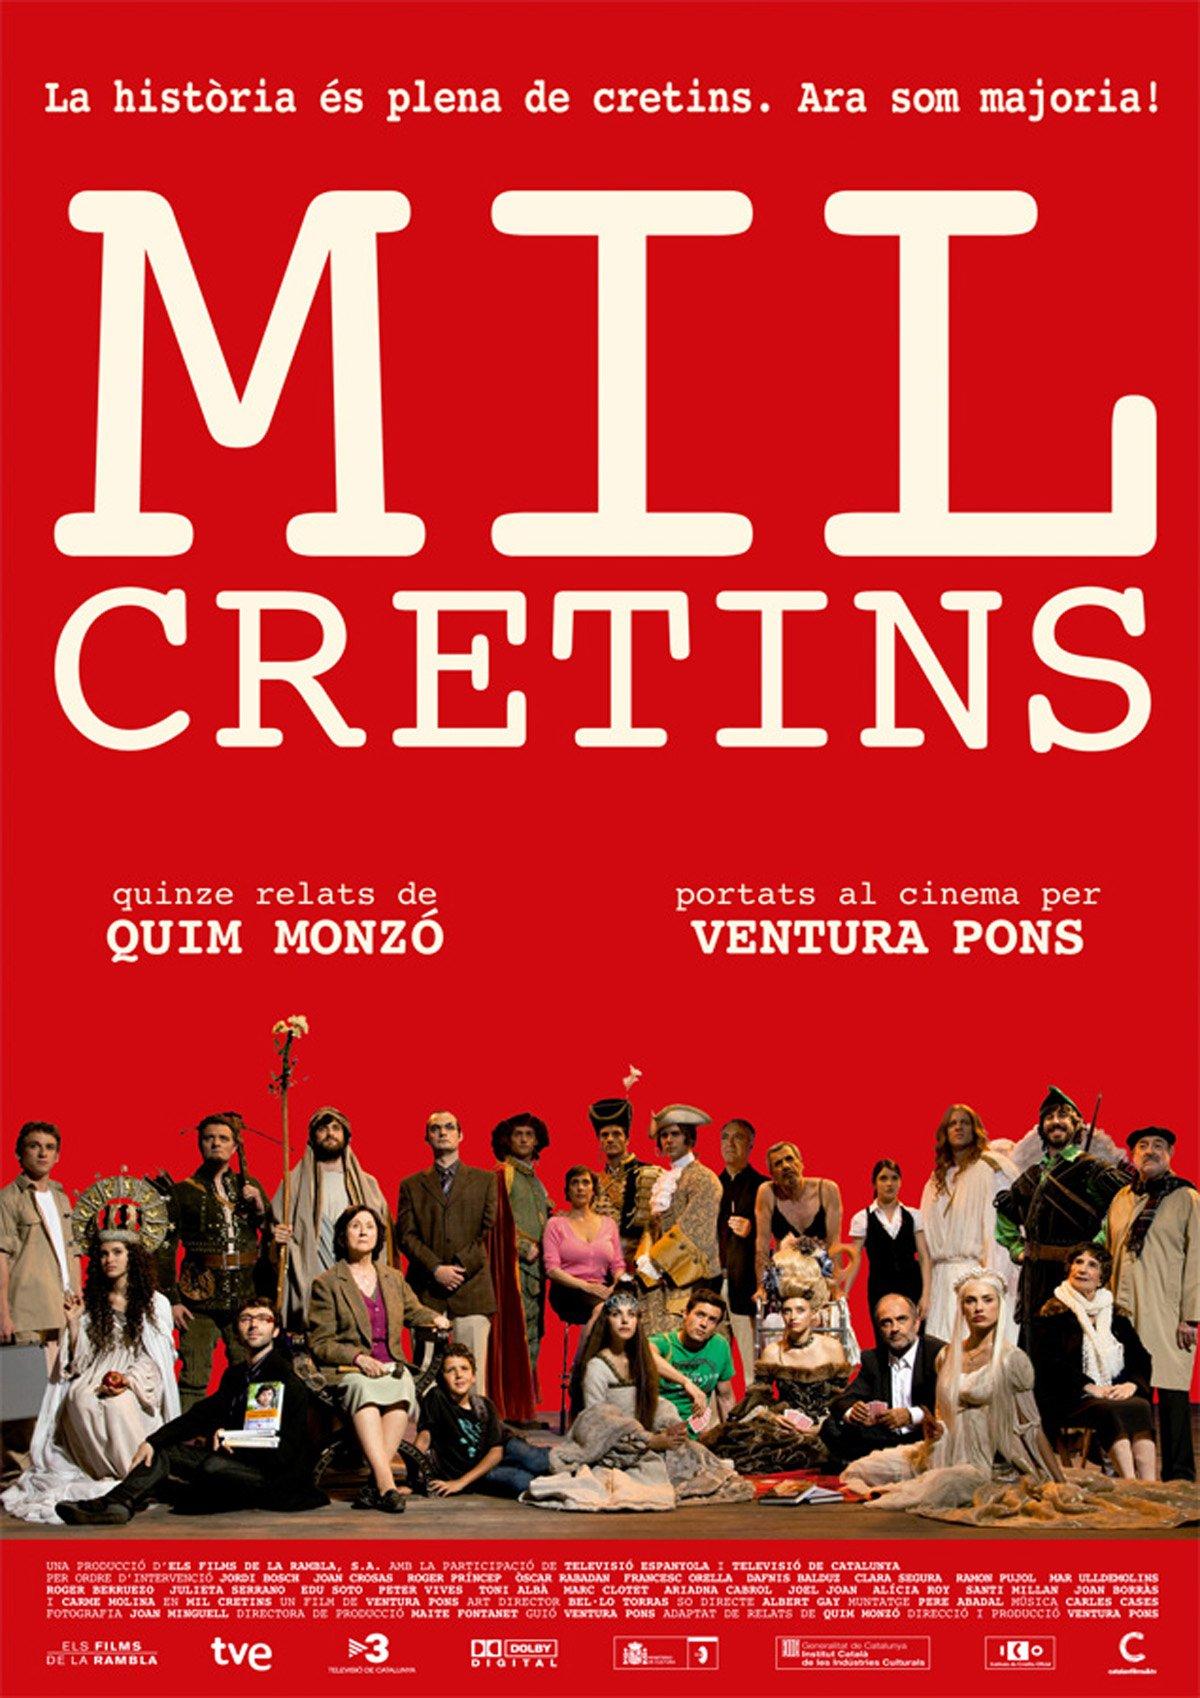 MIL CRETINOS EPUB DOWNLOAD